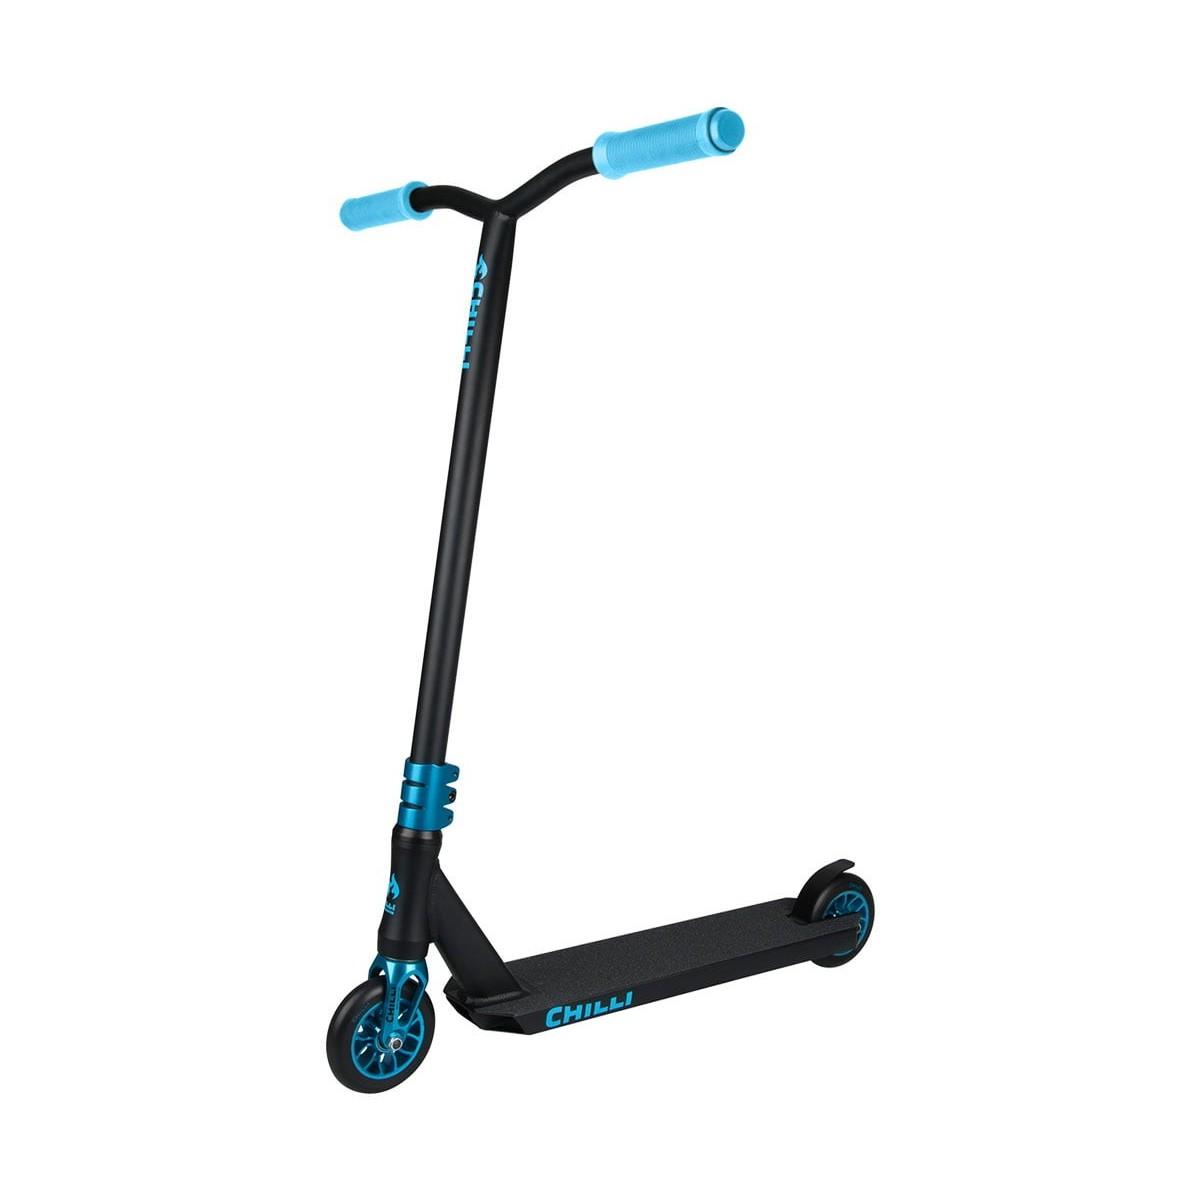 CHILLI scooter REAPER WAVE blue/black